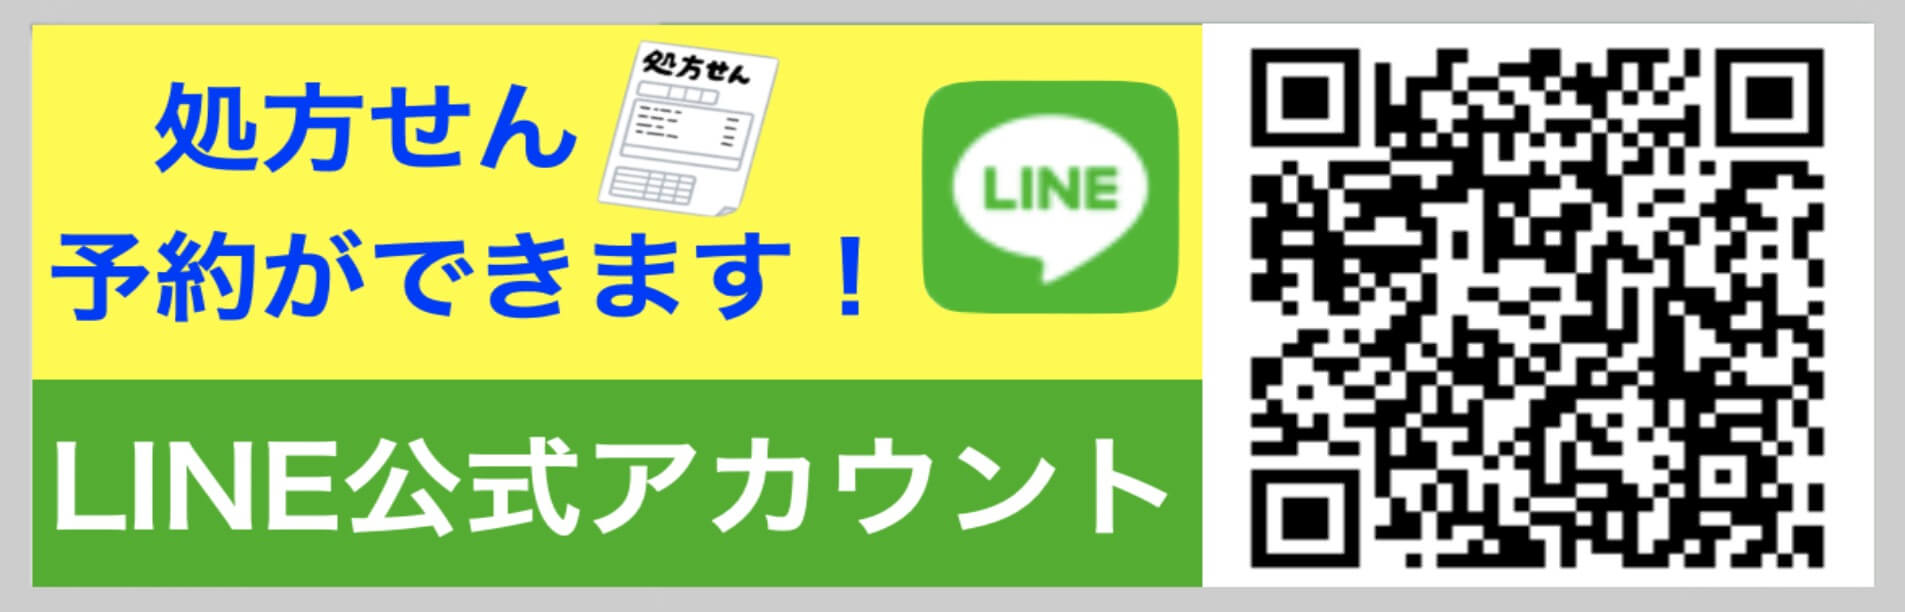 LINE公式アカウント 処方箋の予約 零売の予約 零売 処方箋